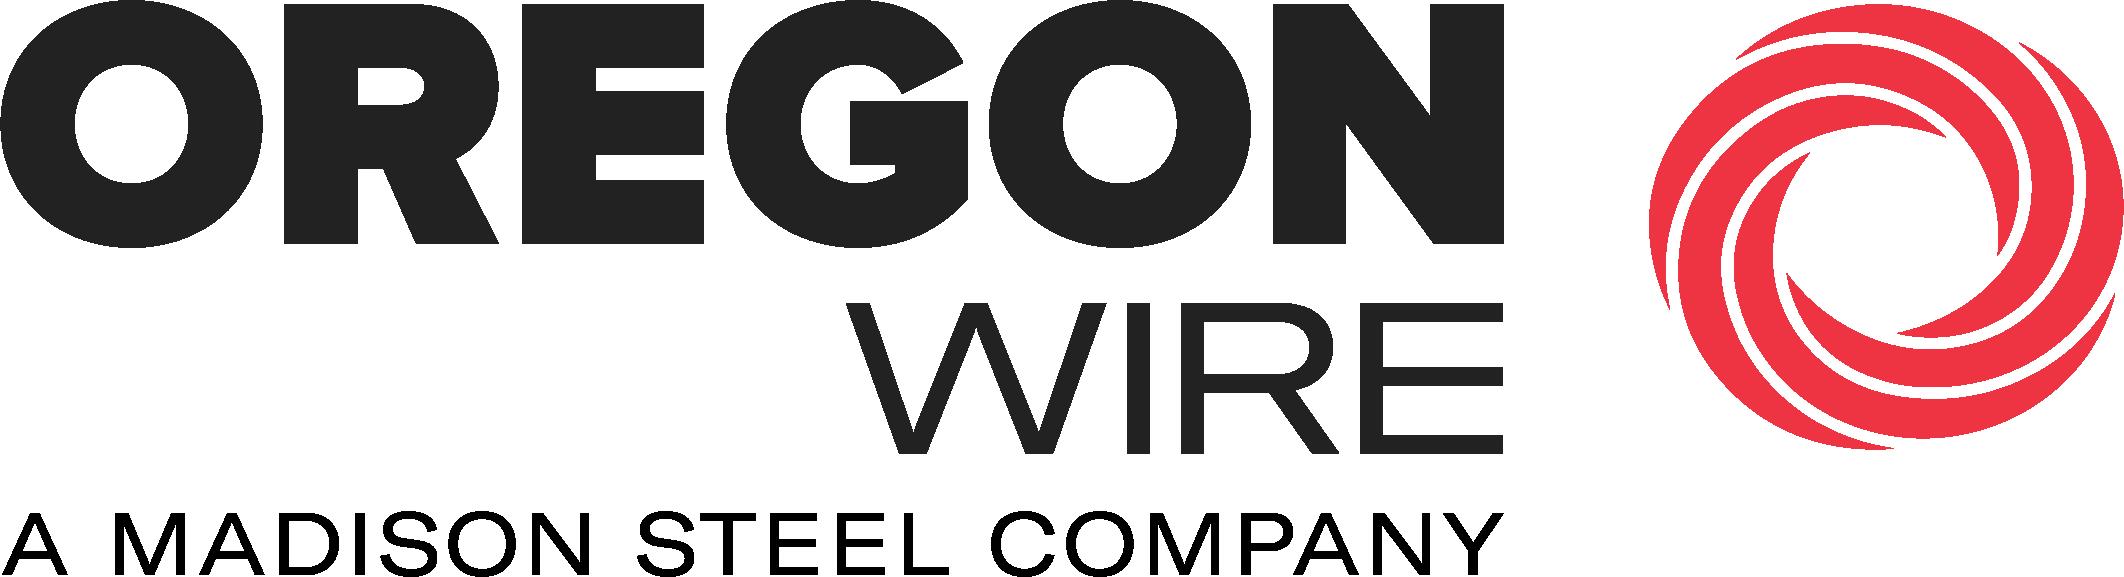 Oregon Wire: A Madison Steel Company logo